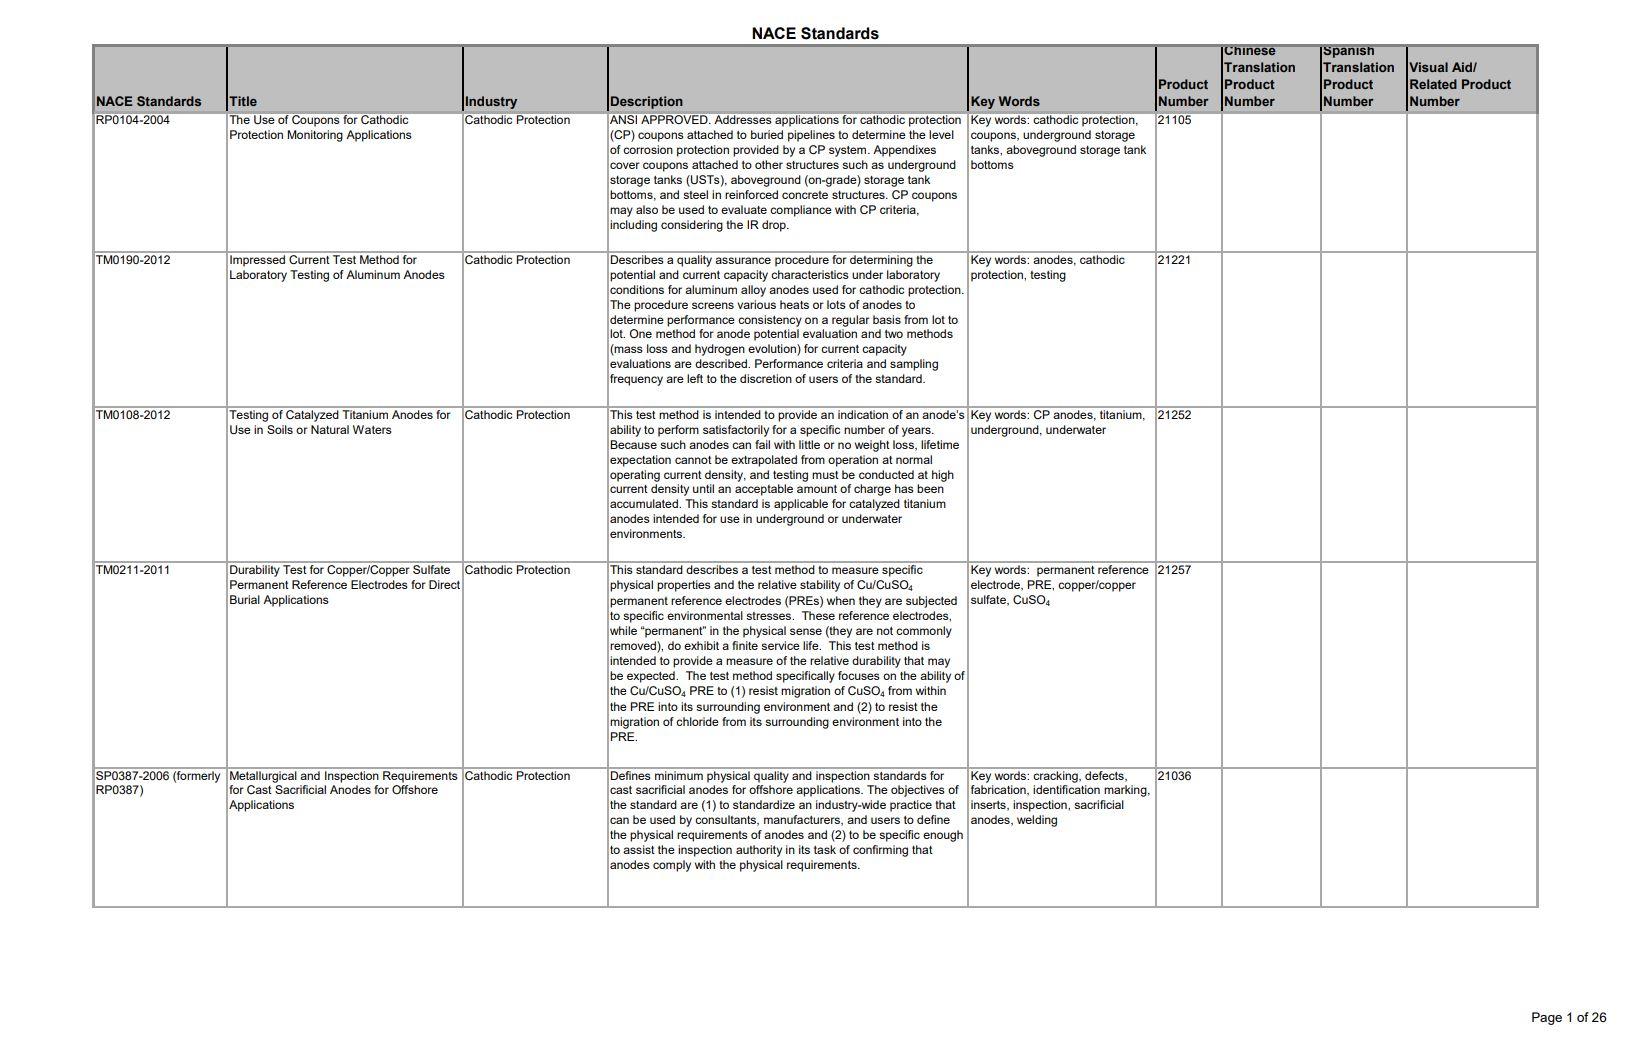 NACE Standards Detailed